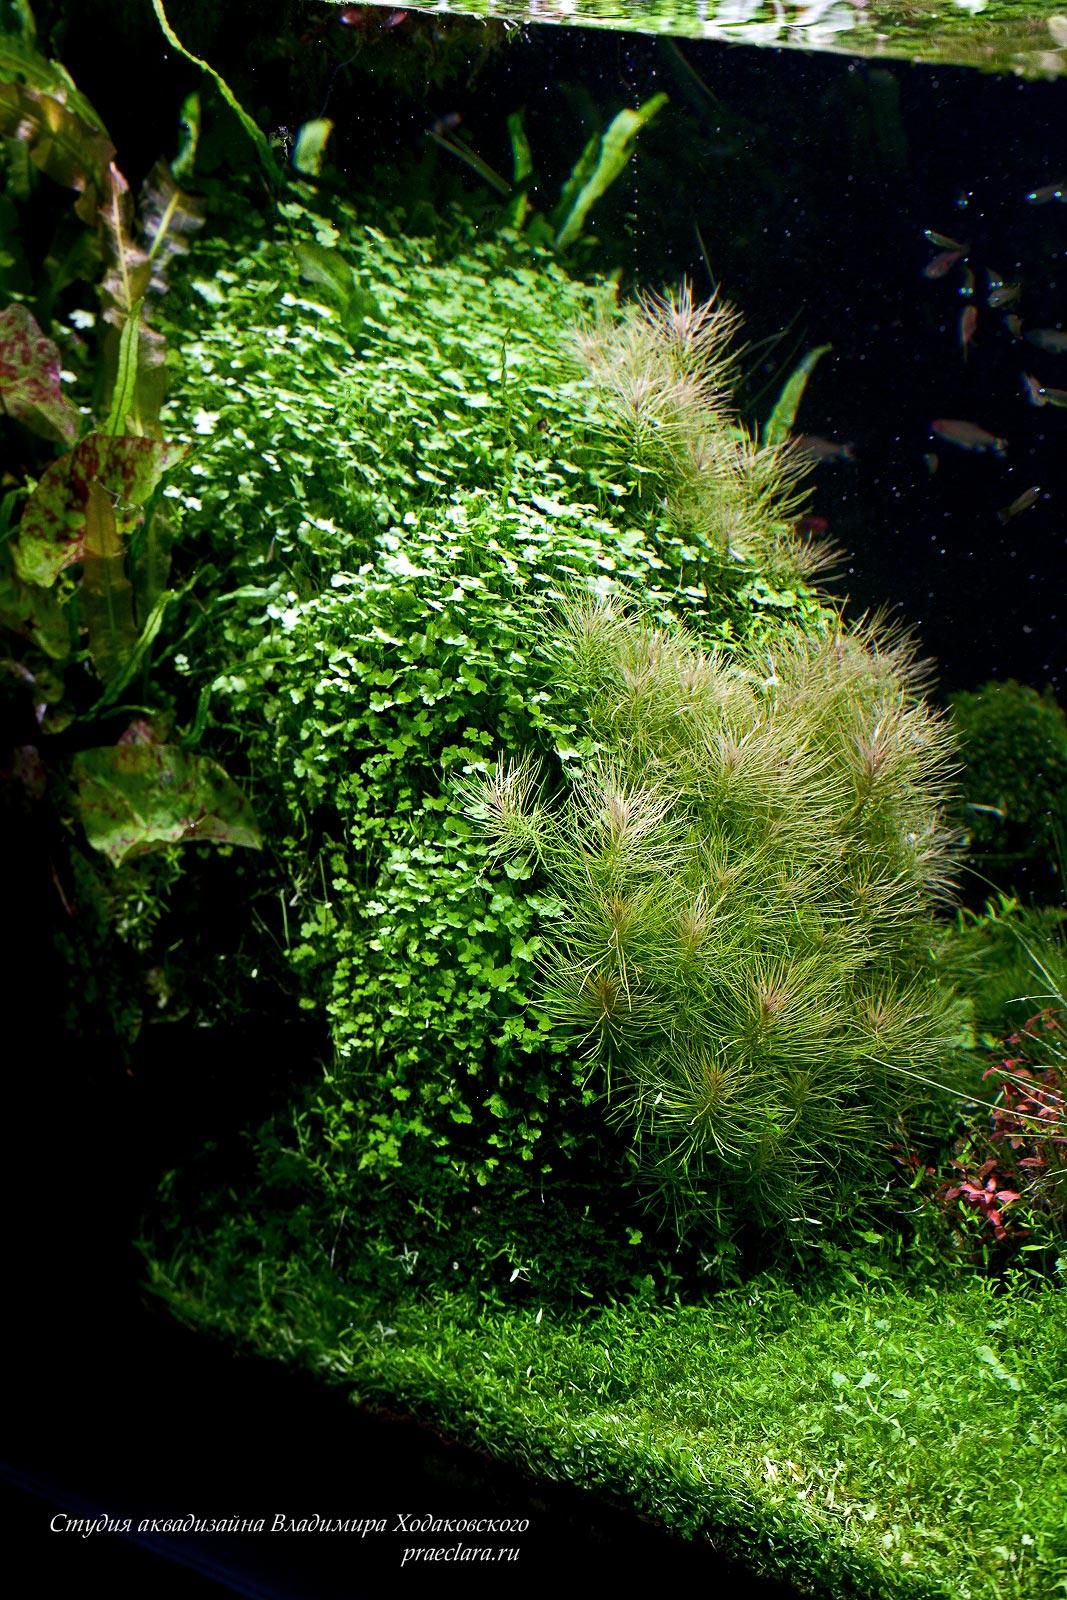 Hydrocotyle tripartita & Pogostemon deccanensis